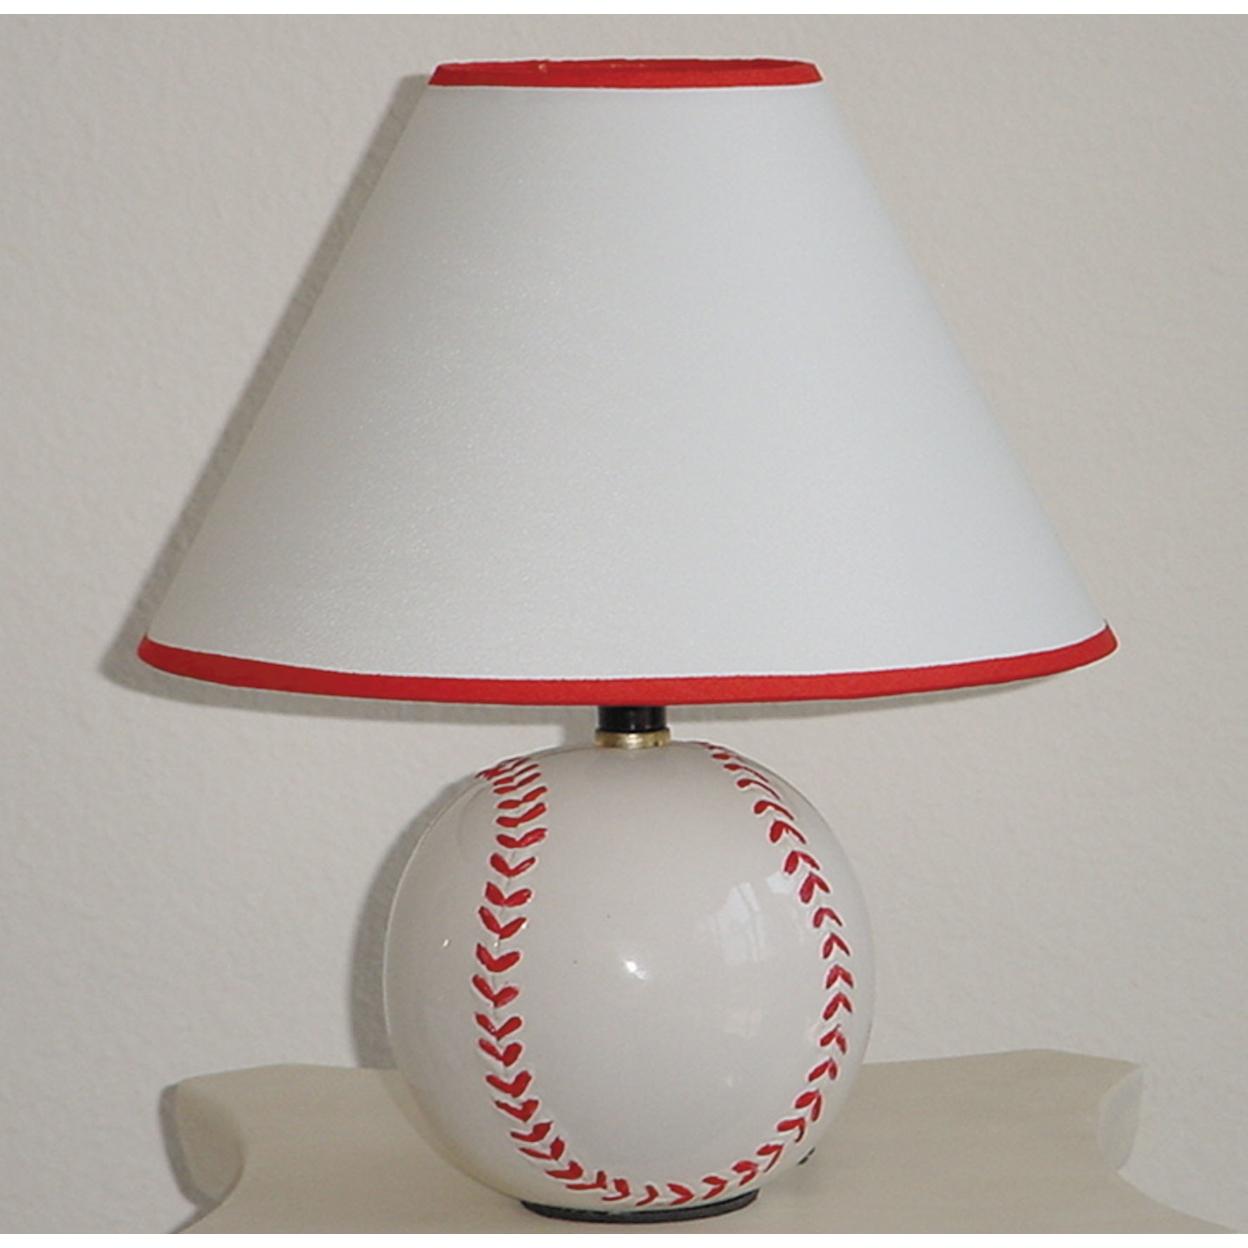 Baseball Inspired Ceramic Table Lamp, Red & White Set of 8 5a09d3e3e22461328209c65a